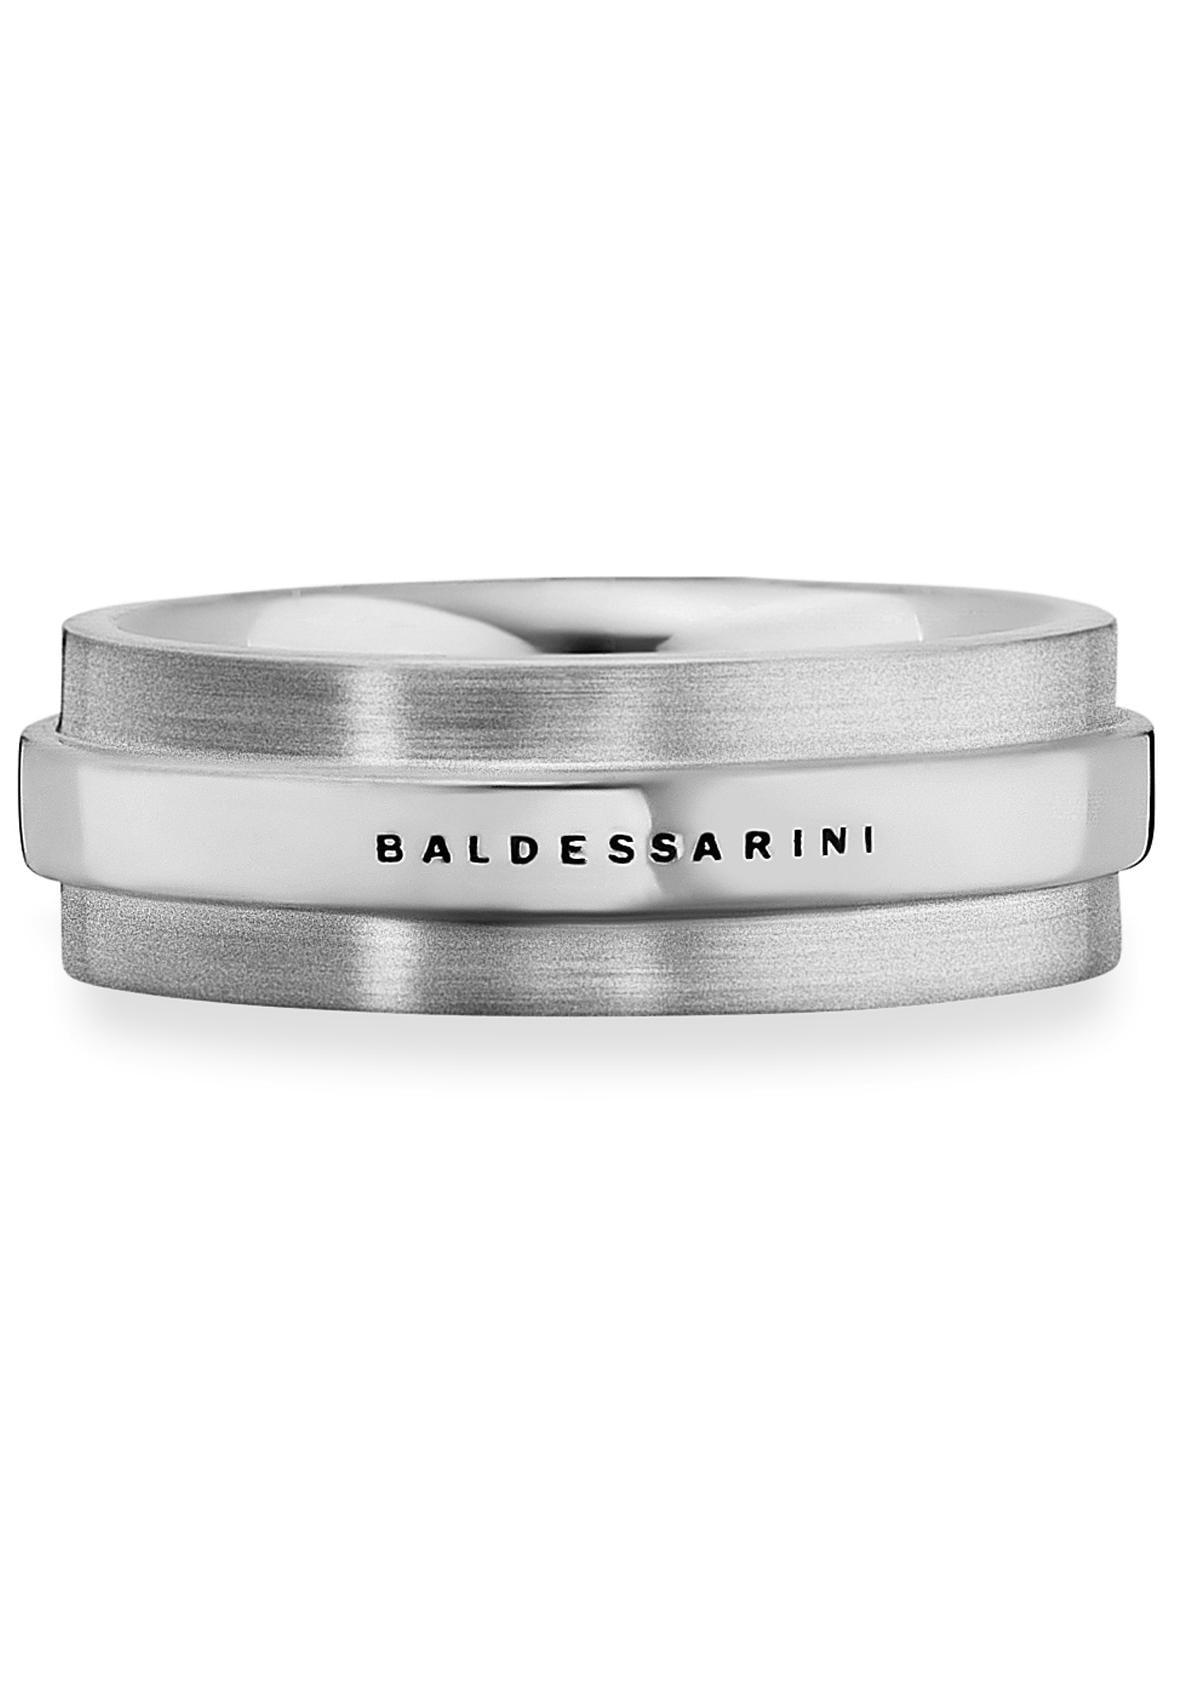 BALDESSARINI Silberring Y2134R/90/00/62 | Schmuck > Ringe > Silberringe | Baldessarini